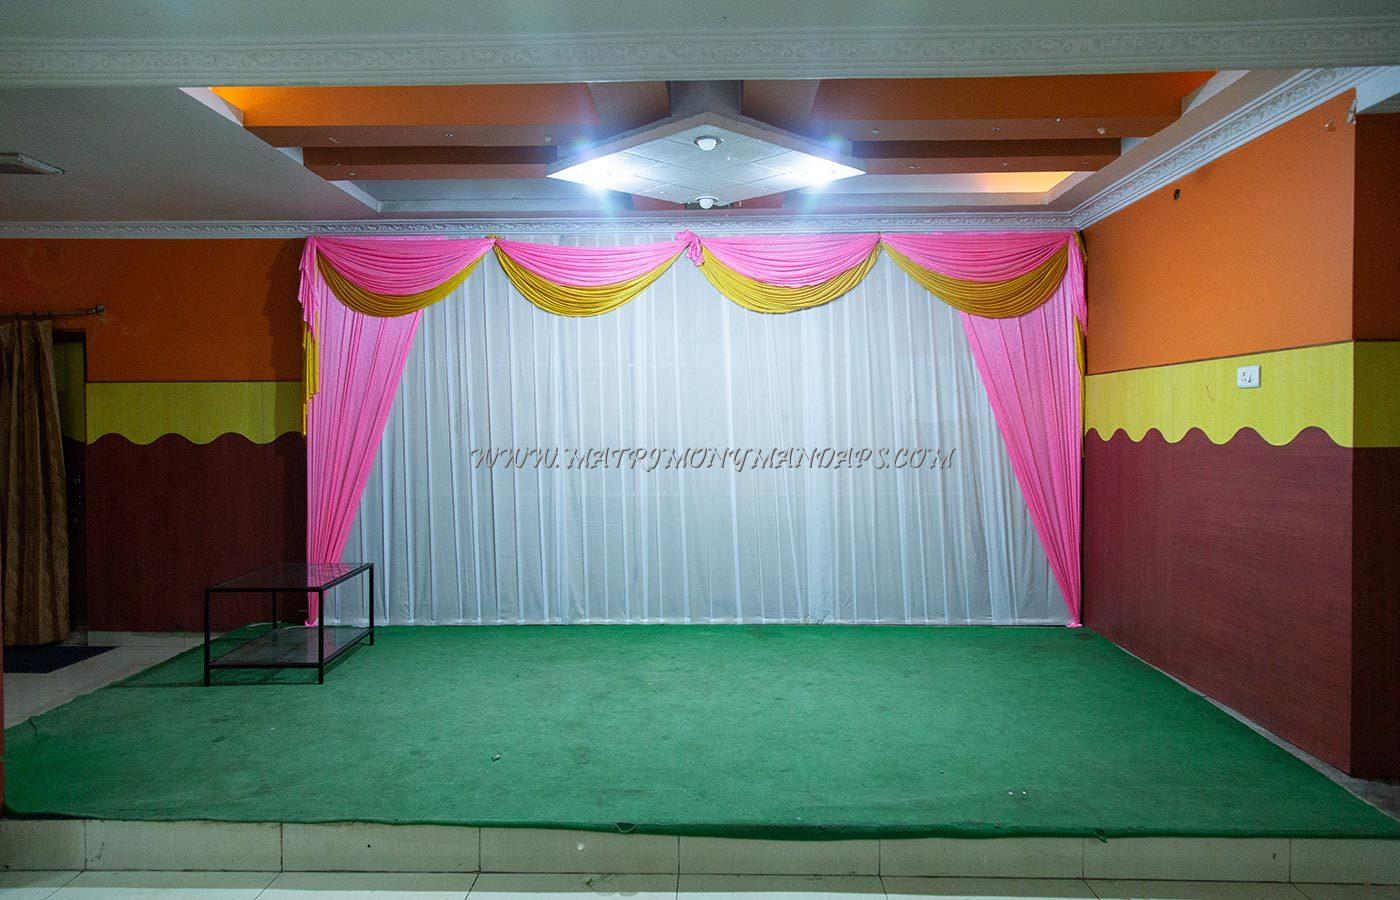 Find More Banquet Halls in Dilsukhnagar